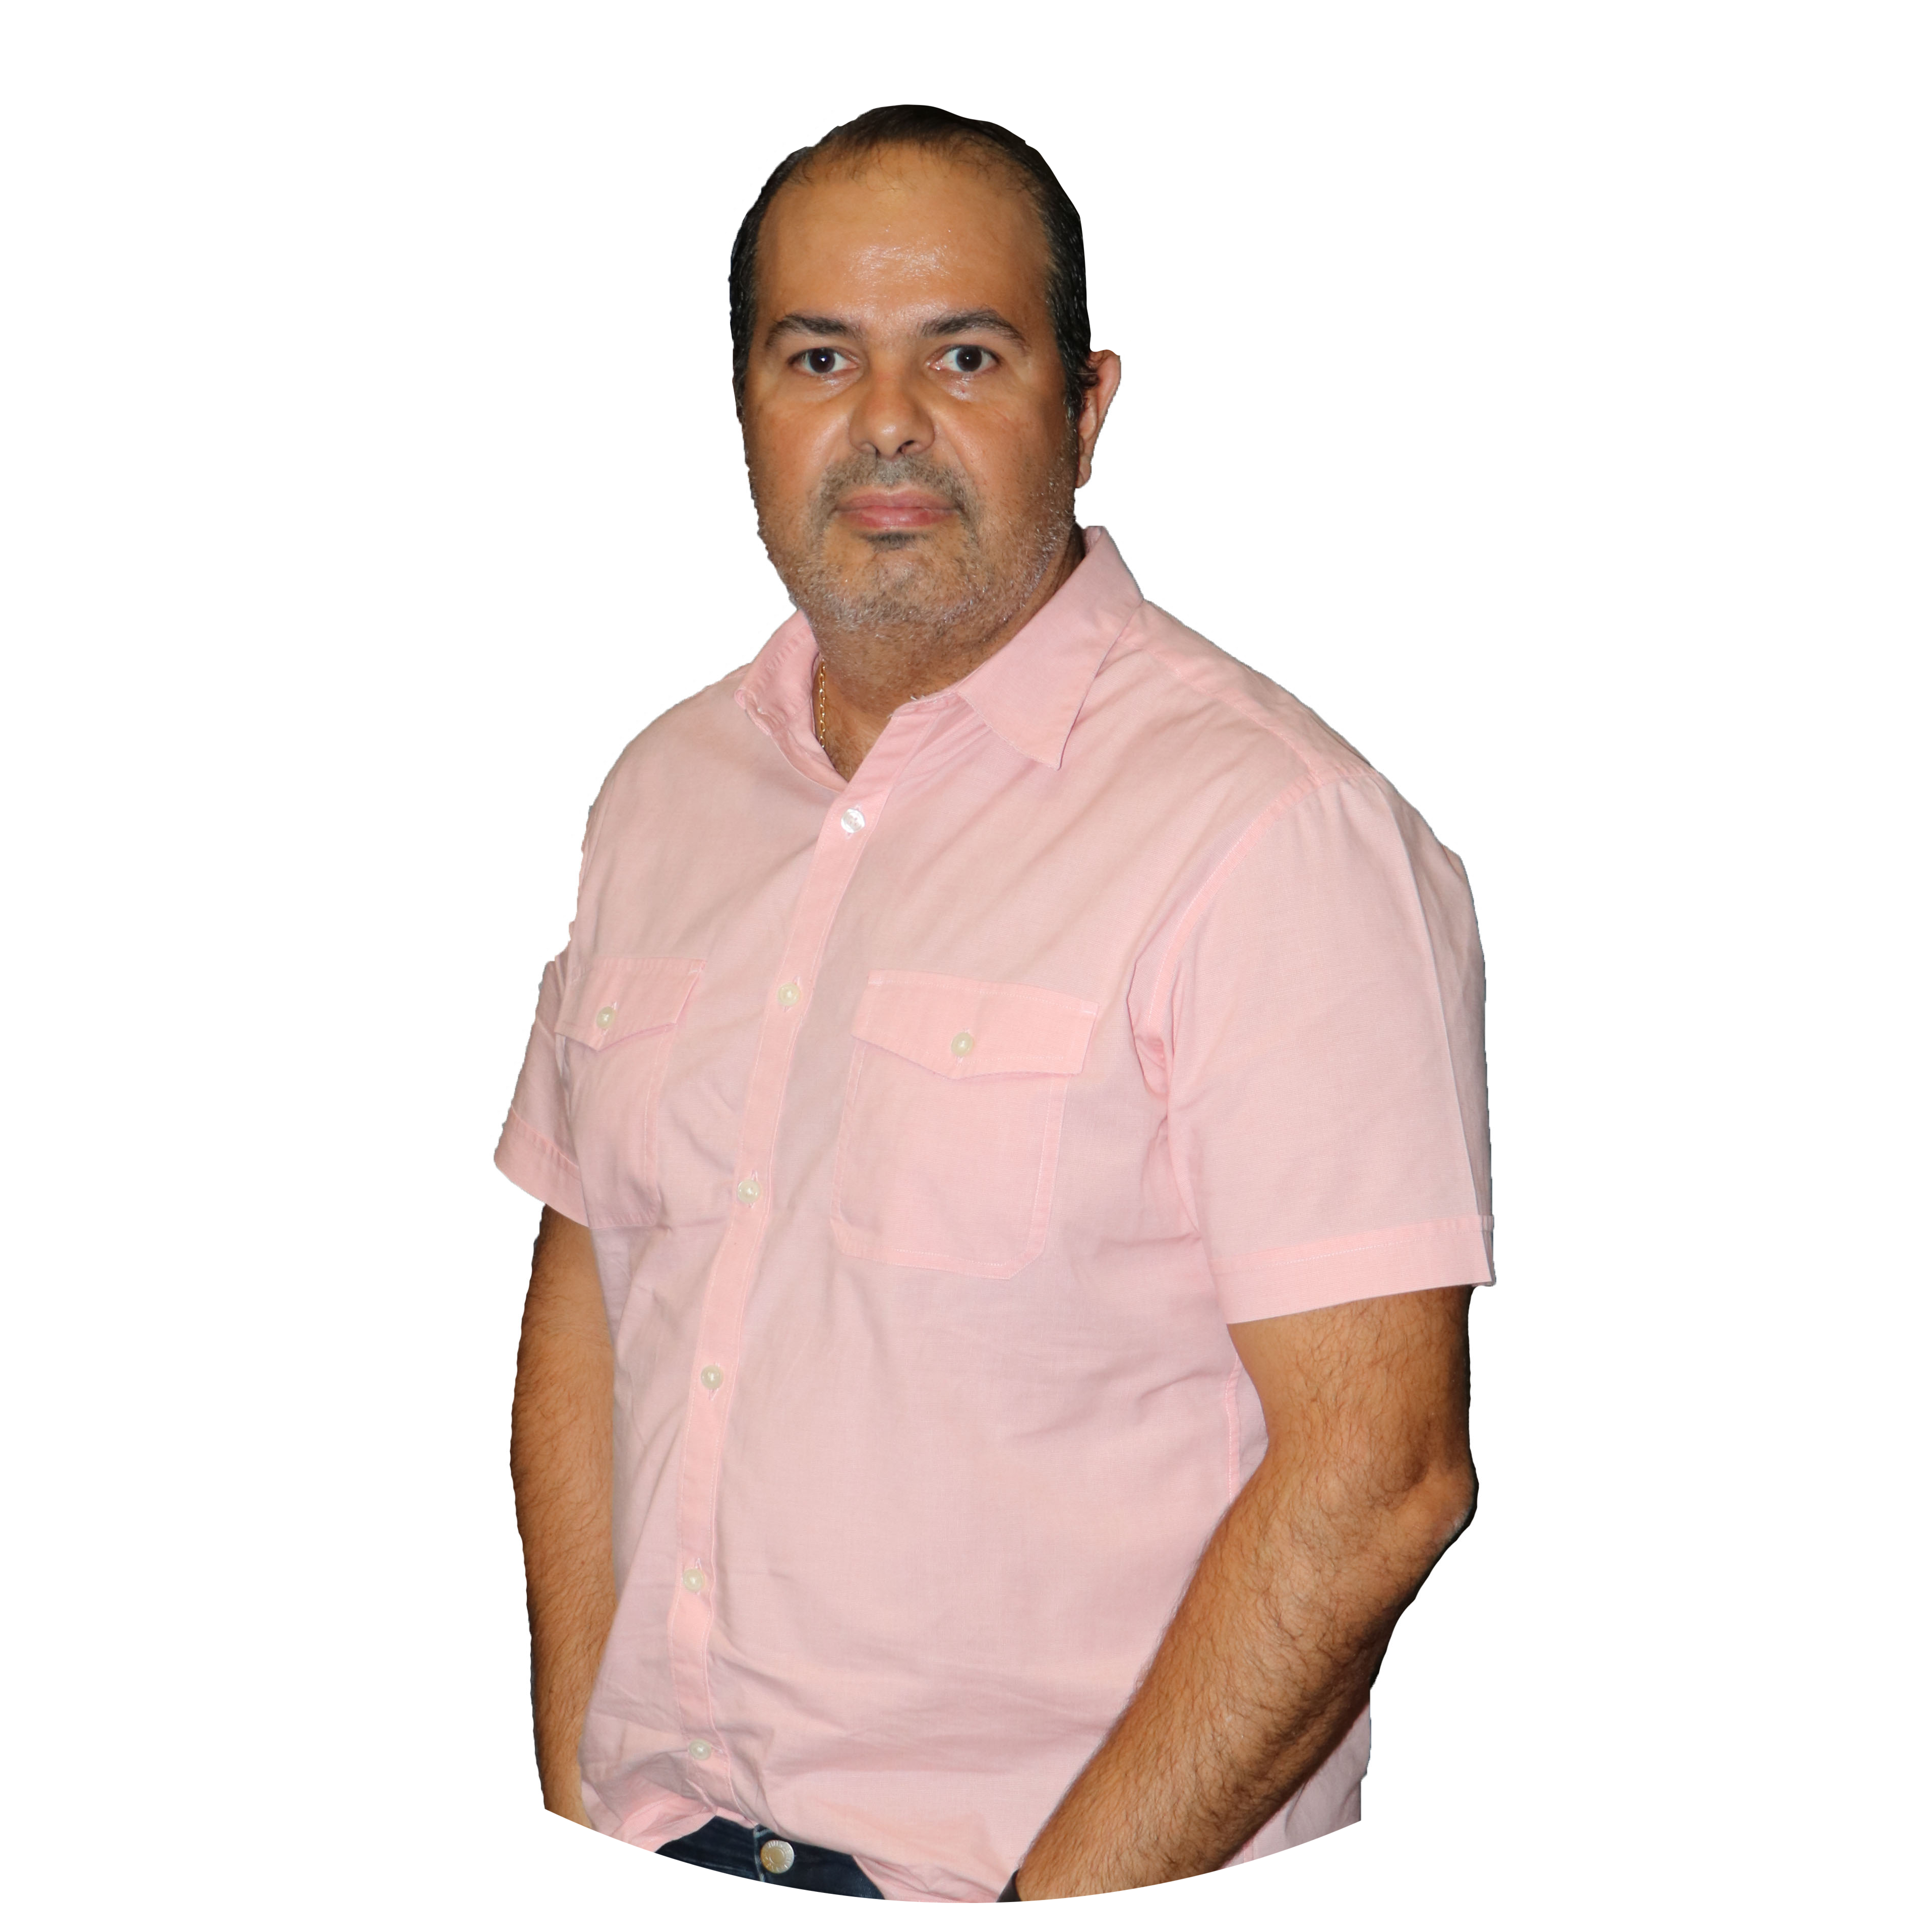 Adriano Jorge Mattoso Rodovalho